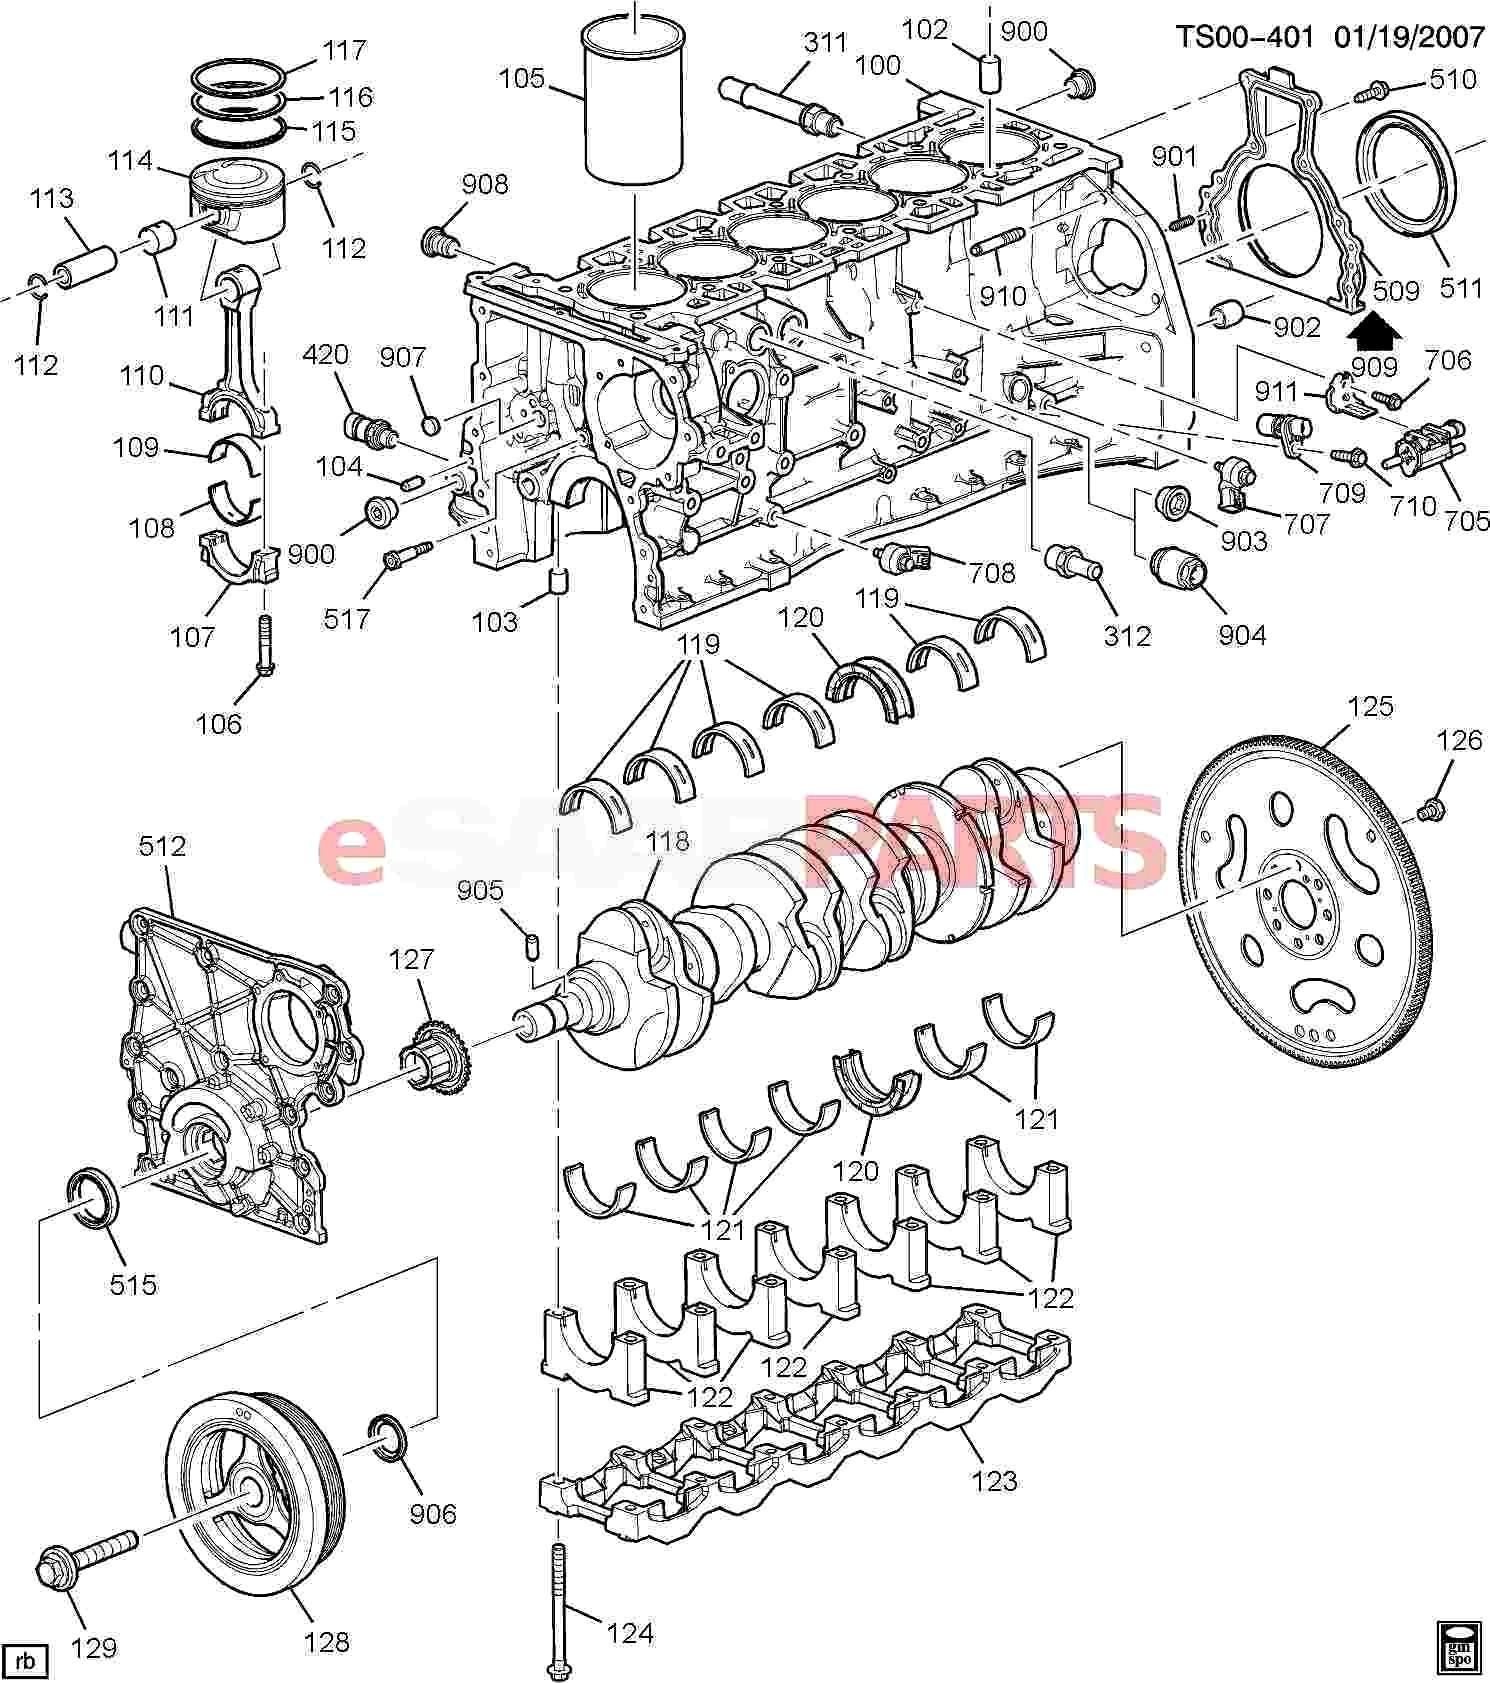 2004 Gmc Yukon Parts Diagram 2018 Chevrolet Performance Parts Catalog Beautiful Chevy Van Parts Of 2004 Gmc Yukon Parts Diagram